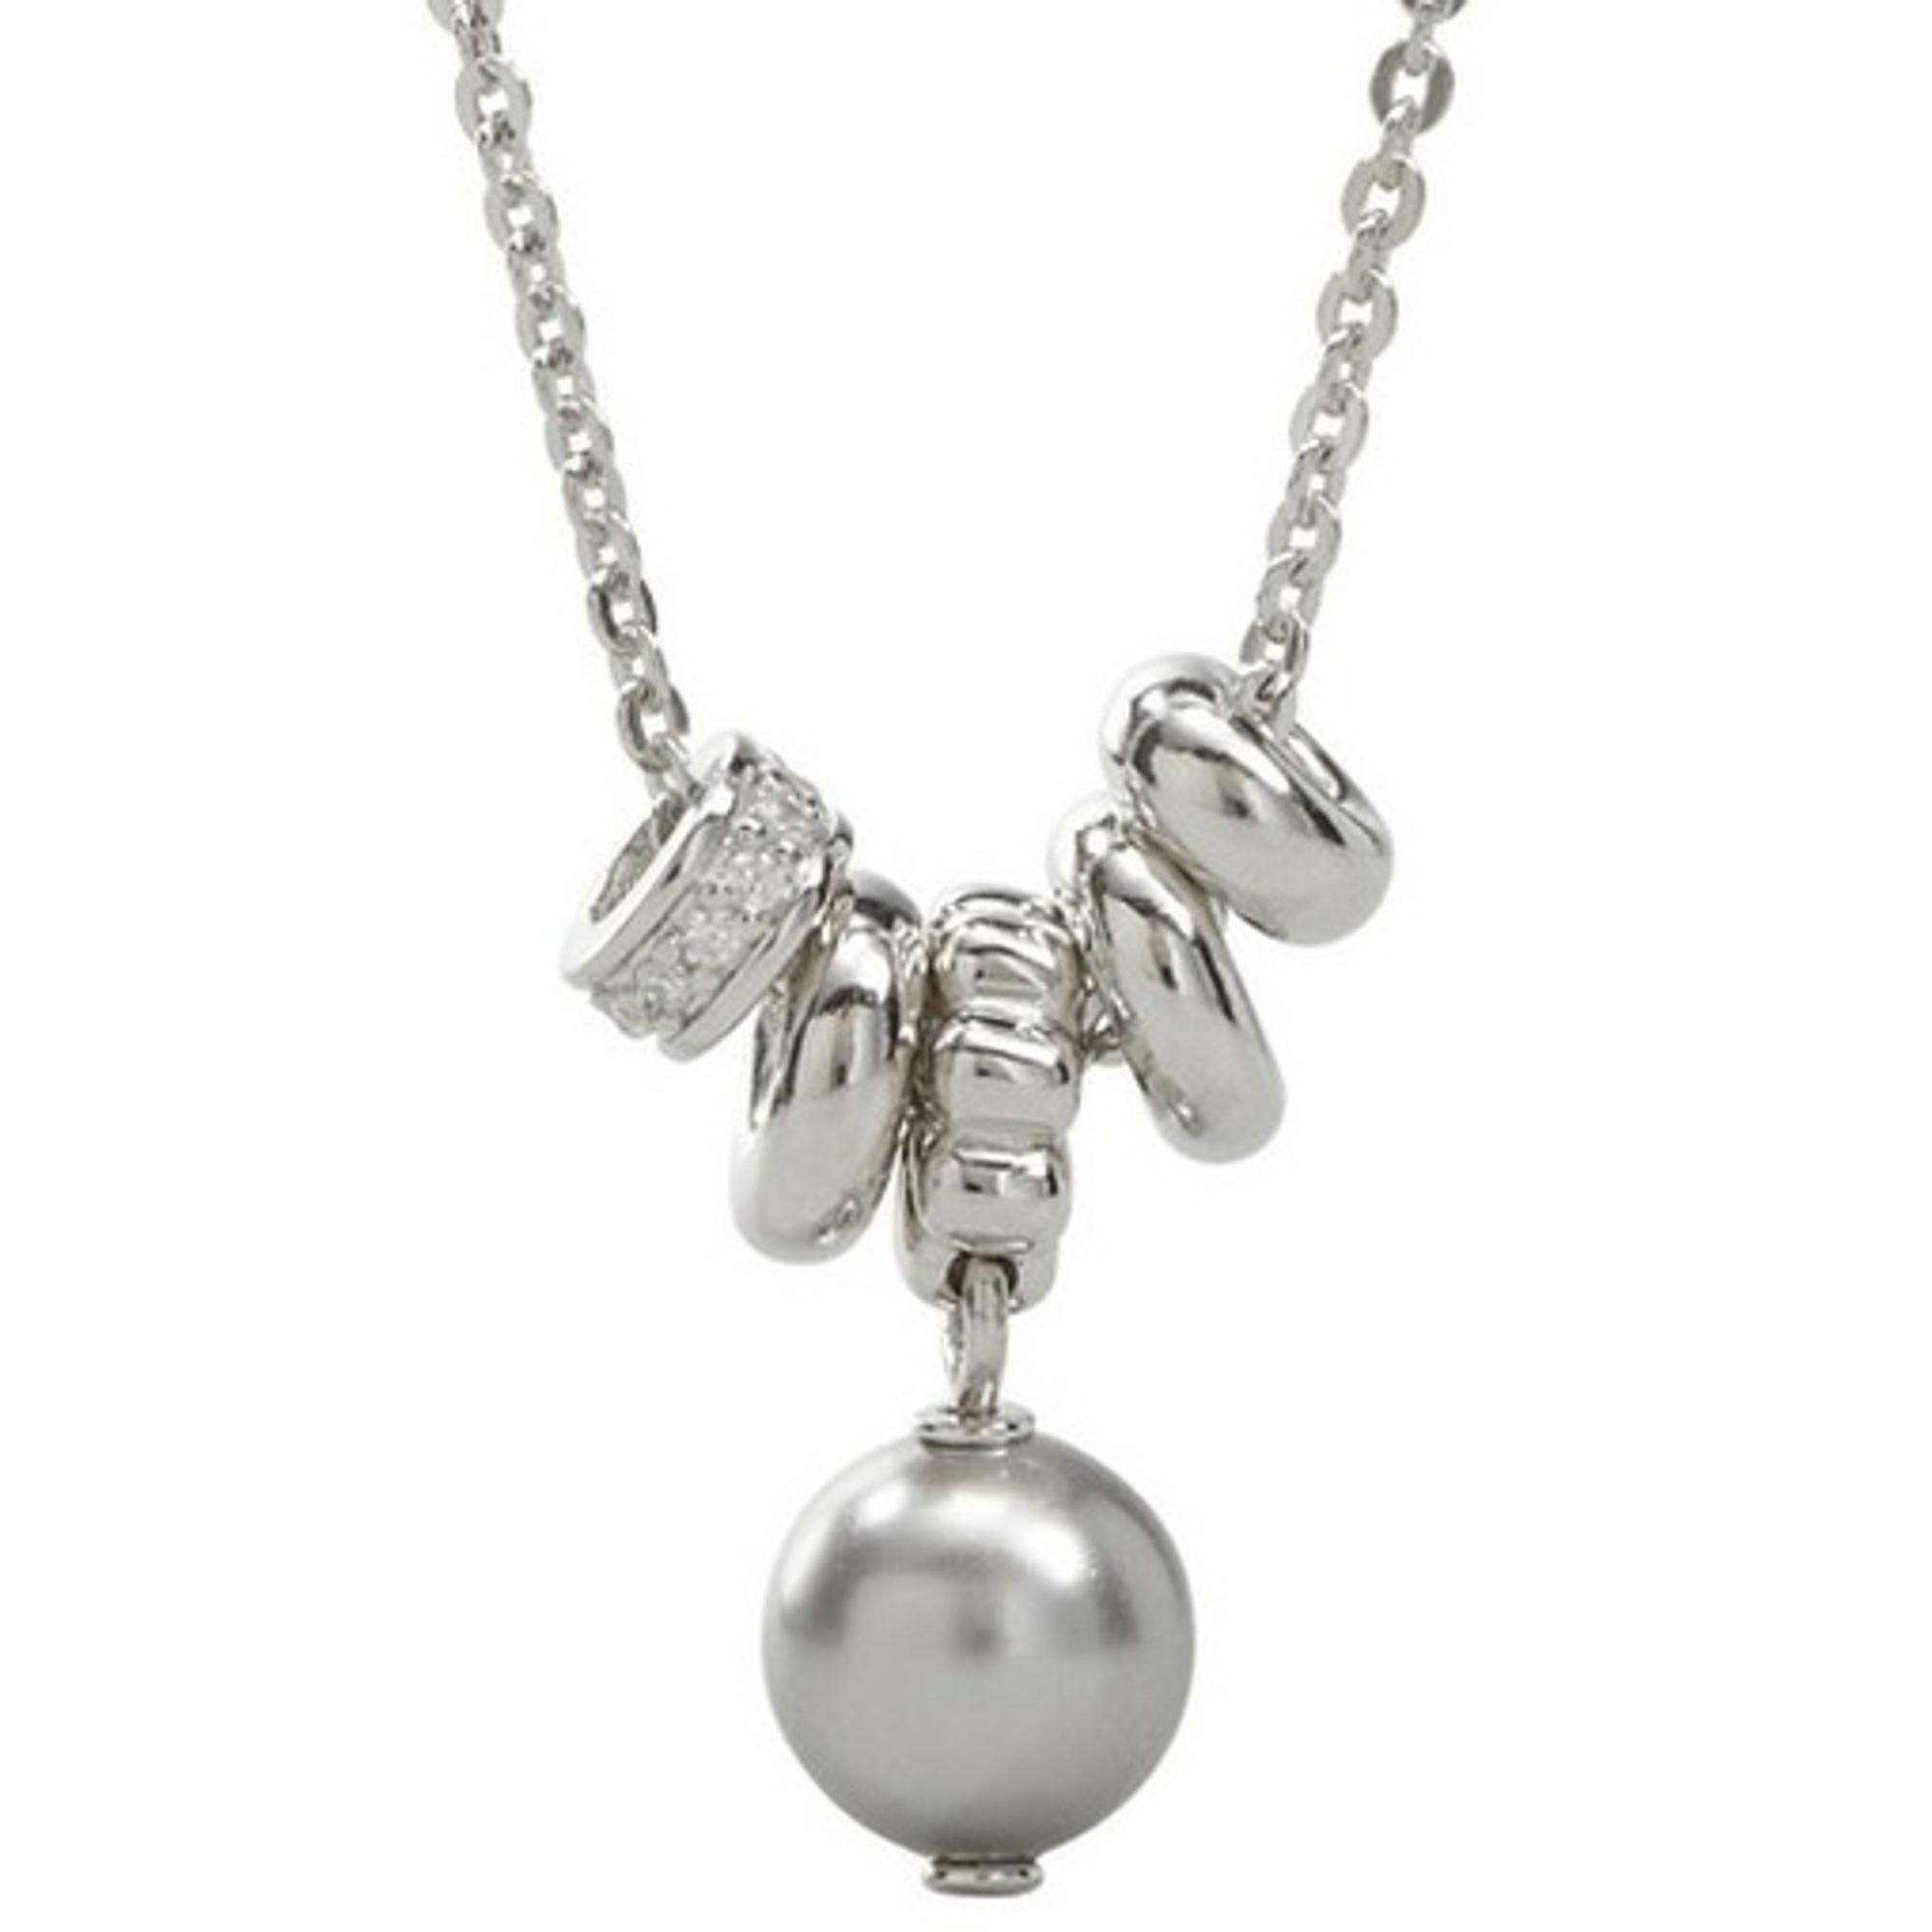 Fossil Halskette JFS00020040 Damen Collier Sterling-Silber 925 47 cm